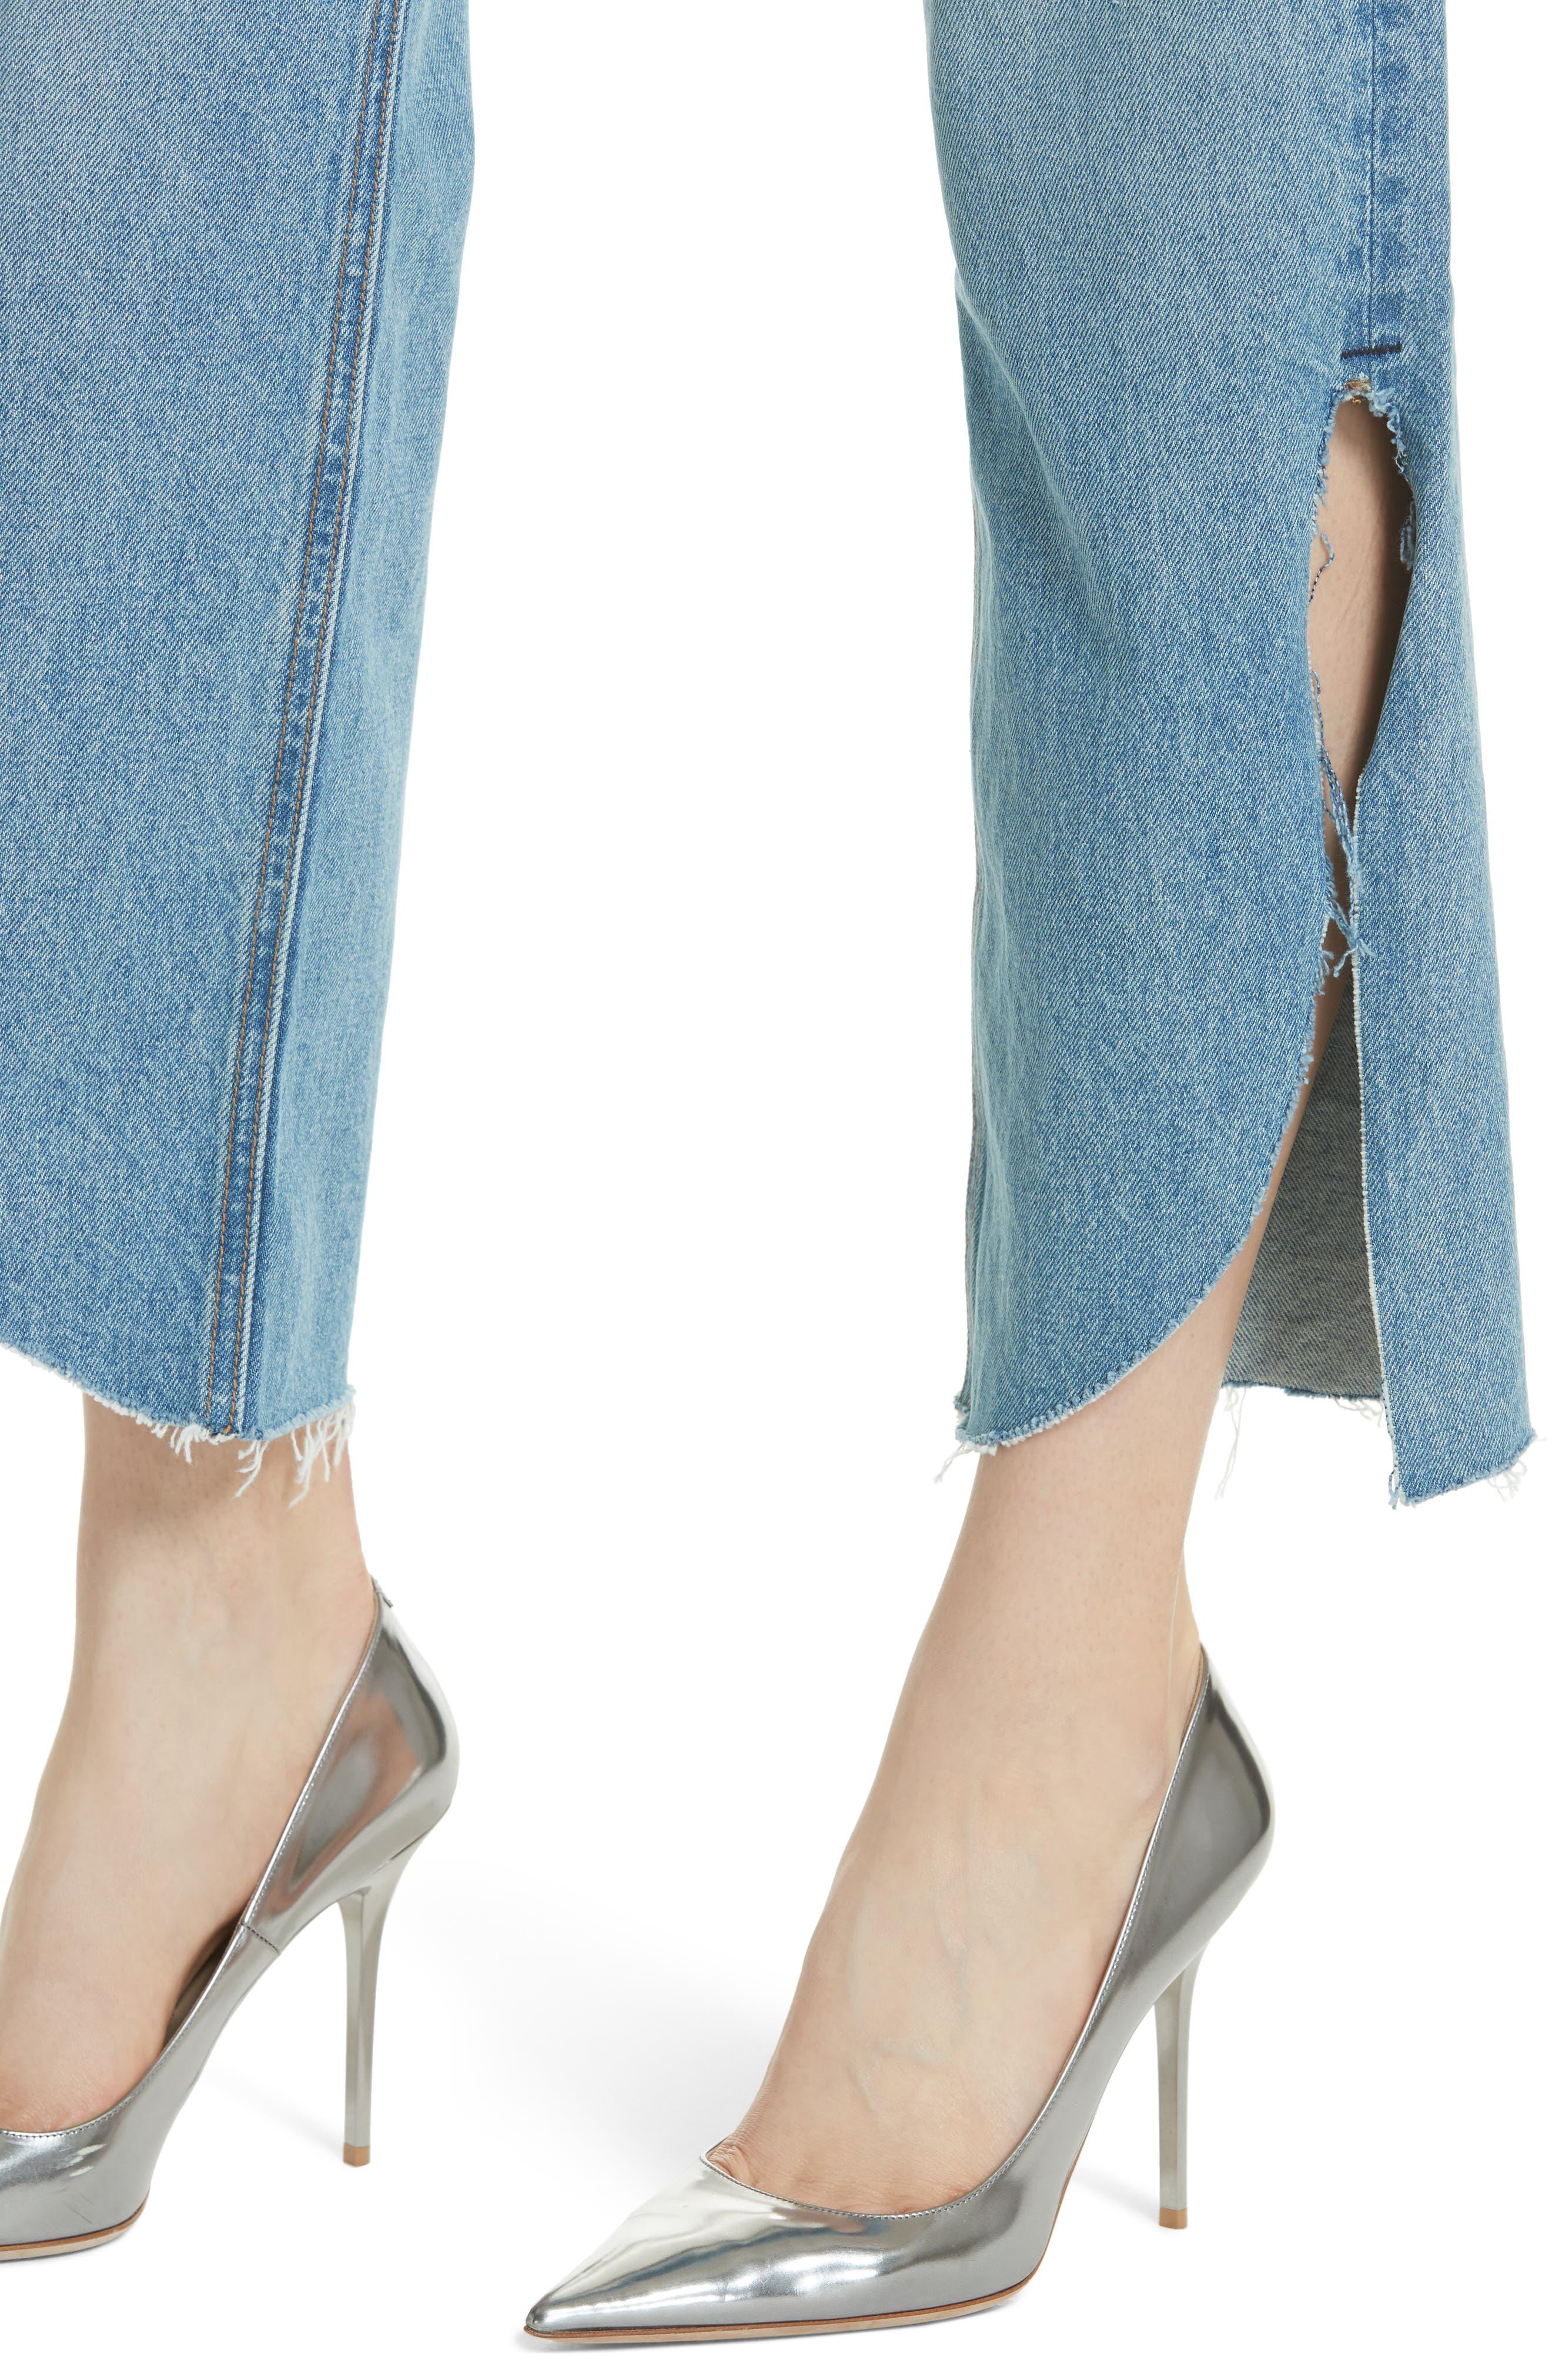 Maran Wide Leg Crop Jeans,                             Alternate thumbnail 4, color,                             483